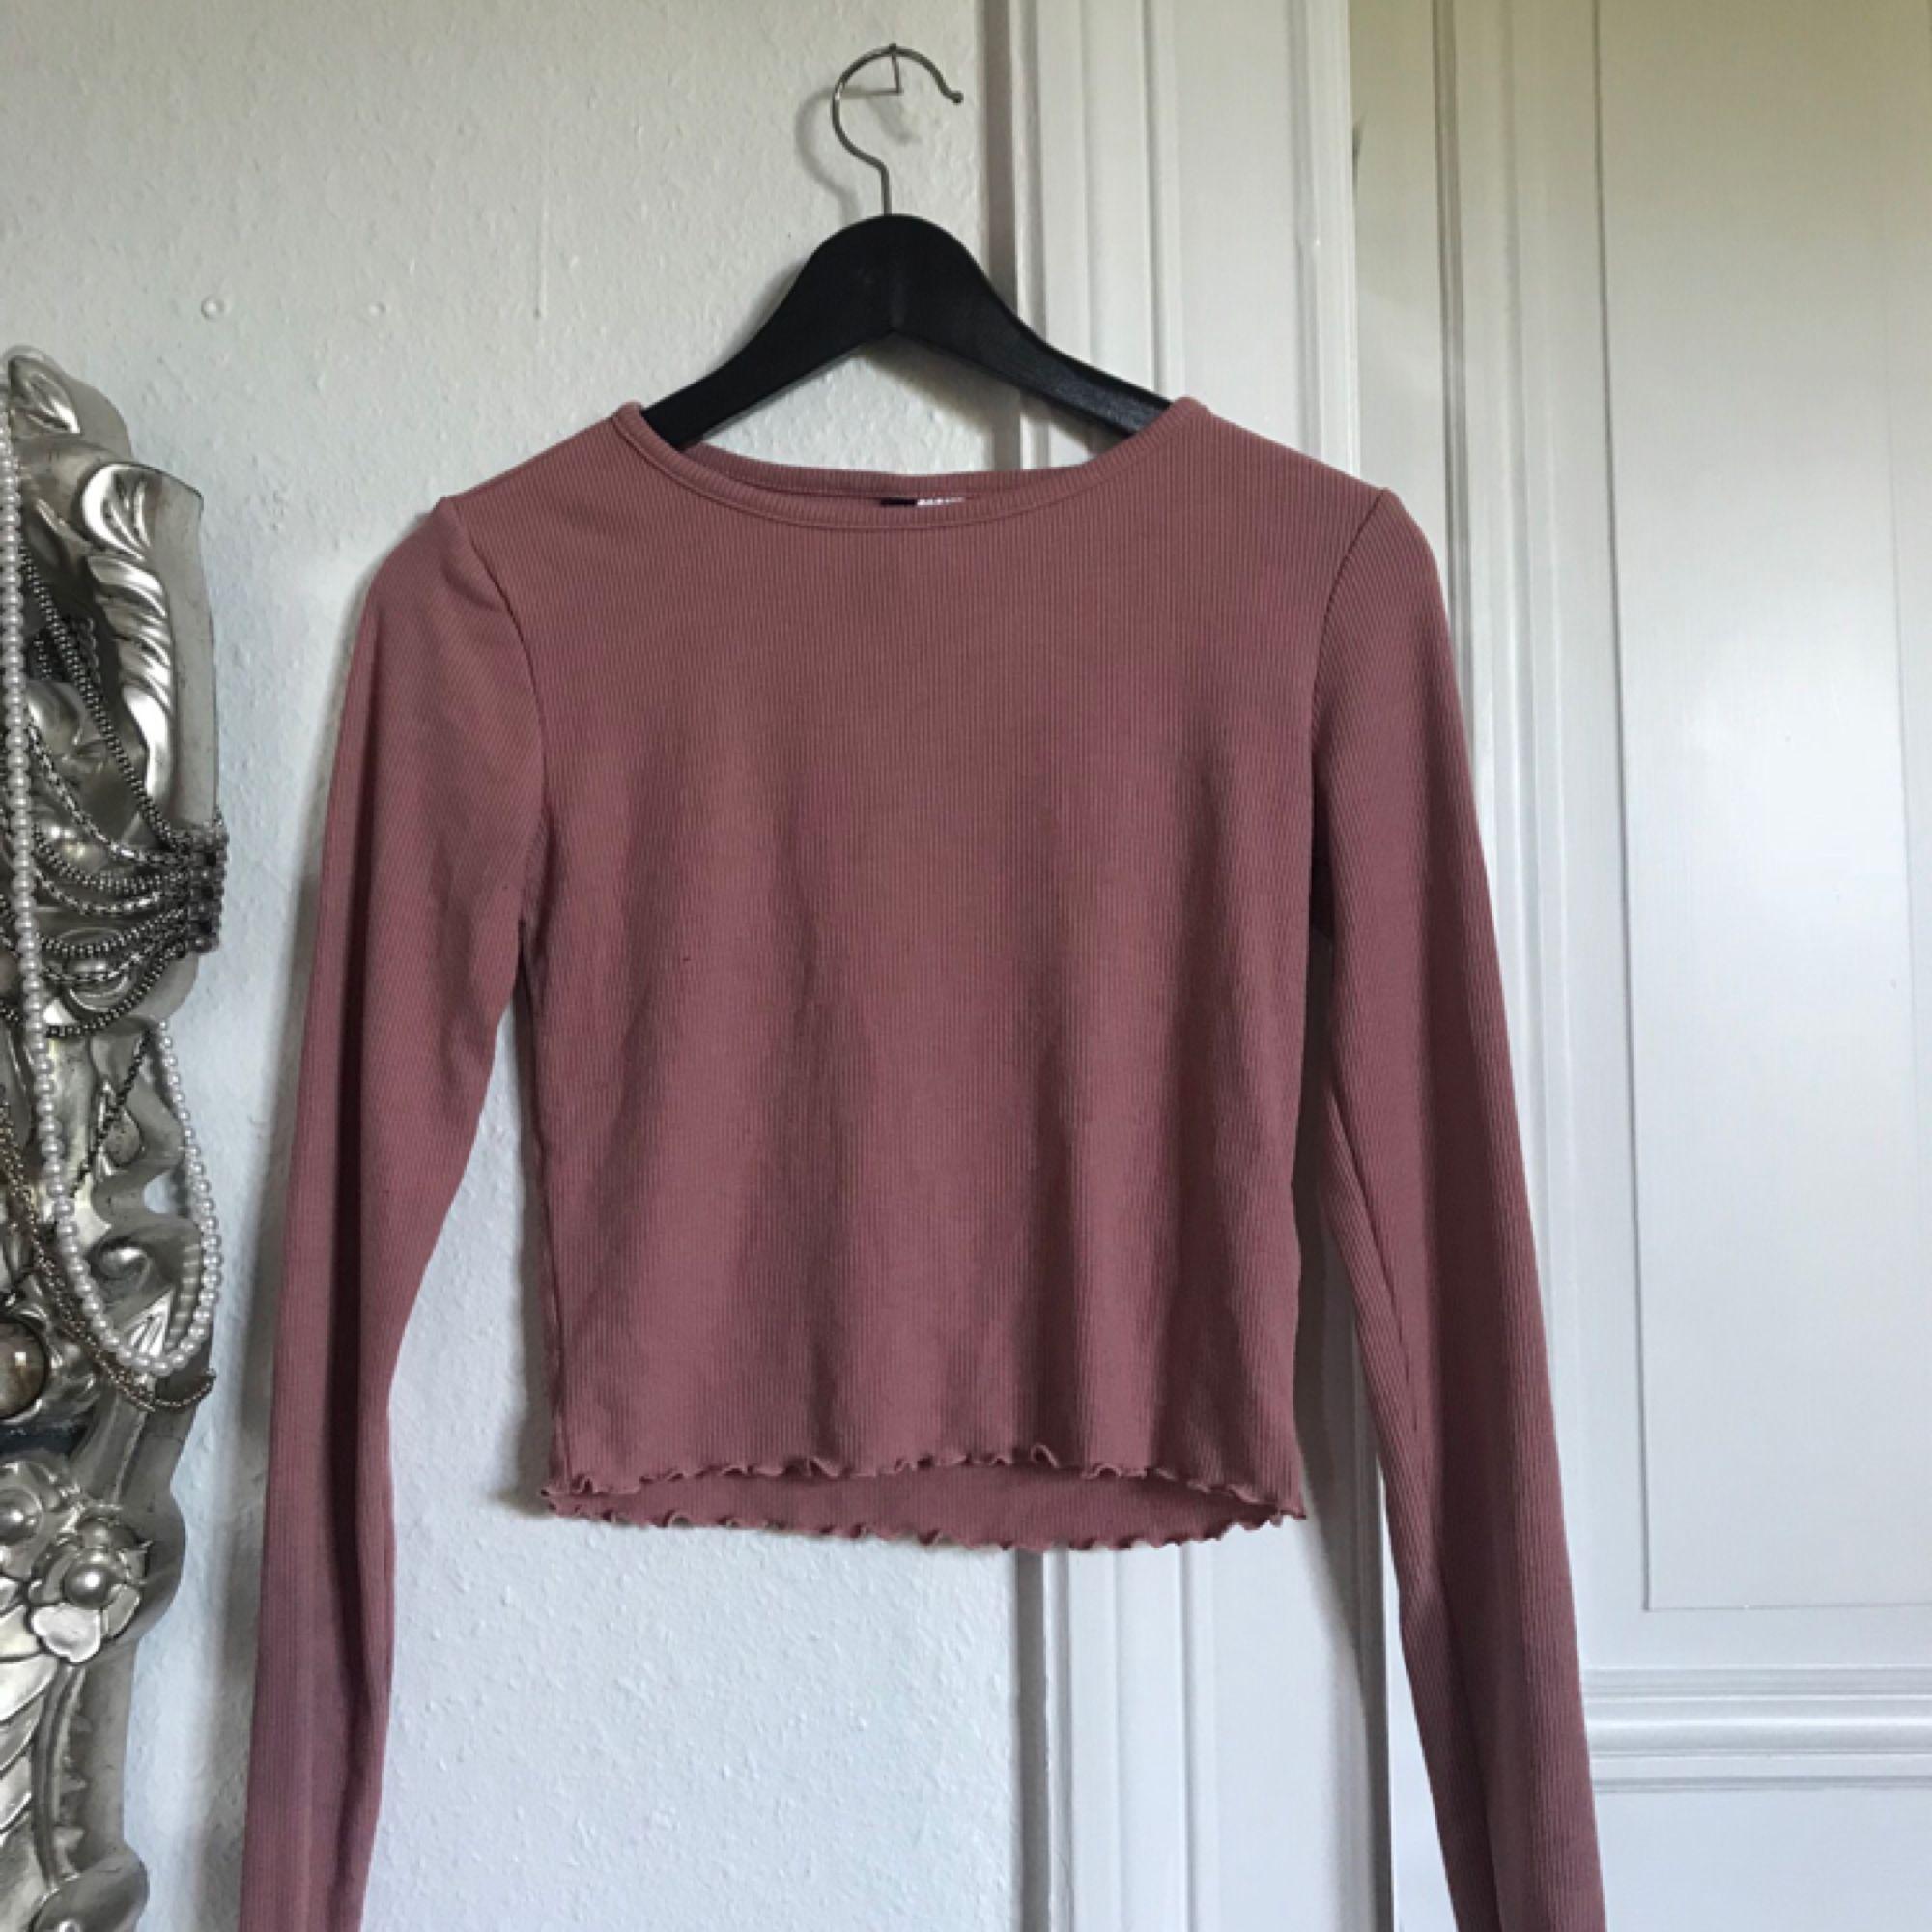 Ribbad gammelrosa tröja från h&m, fint skick!! Frakt: 40kr💌🎈. Toppar.